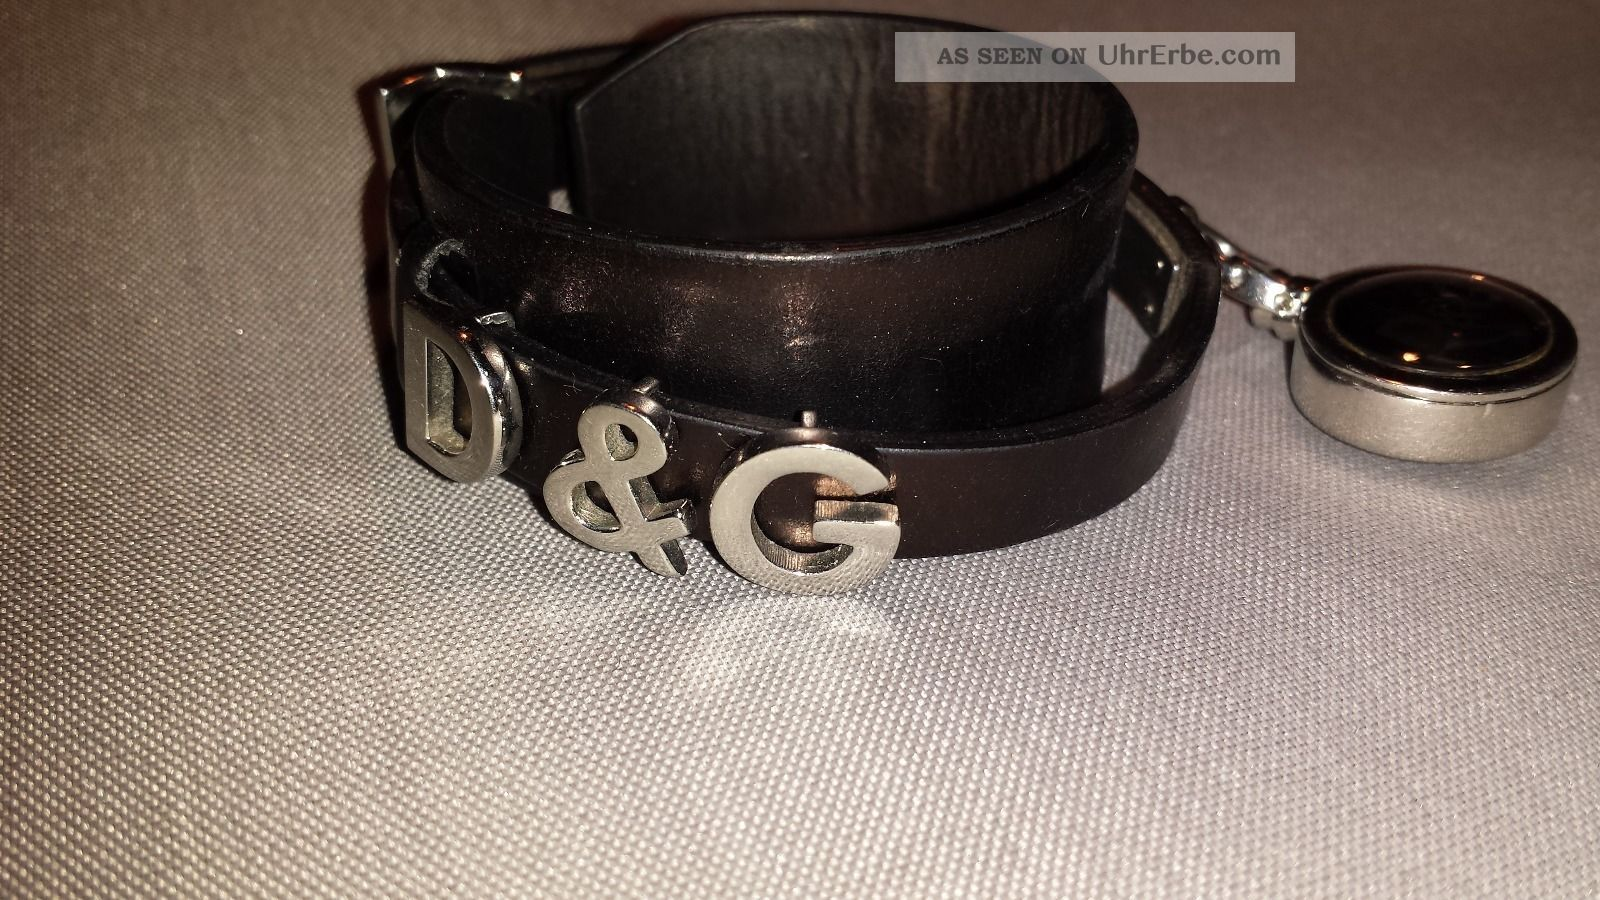 D&g Dolce&gabbana Armband Leder Stahl Mit Kleiner Uhr Armbanduhren Bild